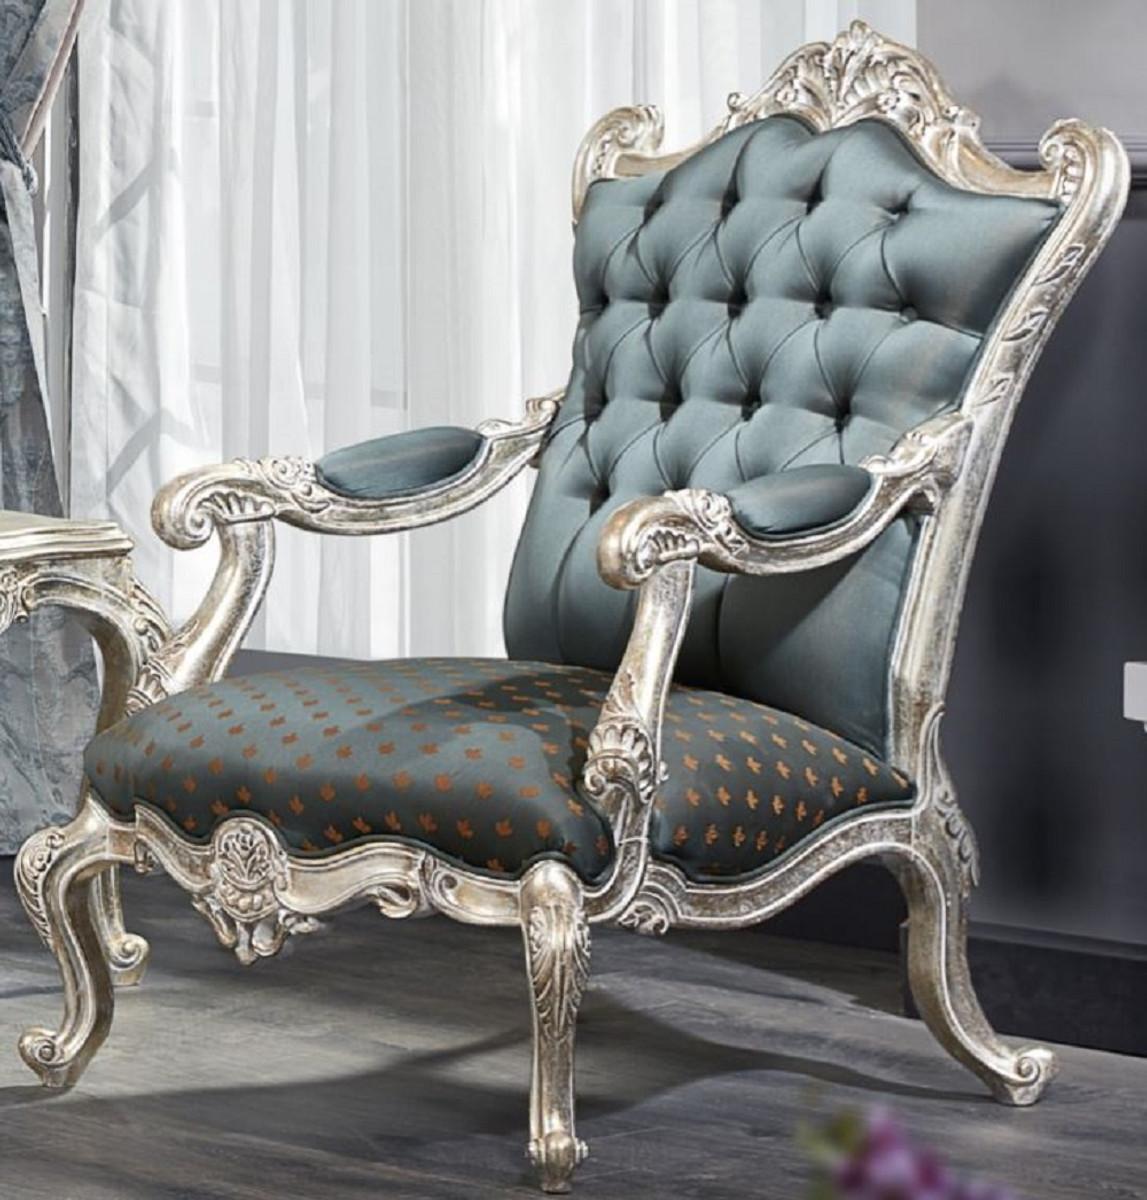 Casa Padrino Luxury Baroque Chesterfield Throne Armchair